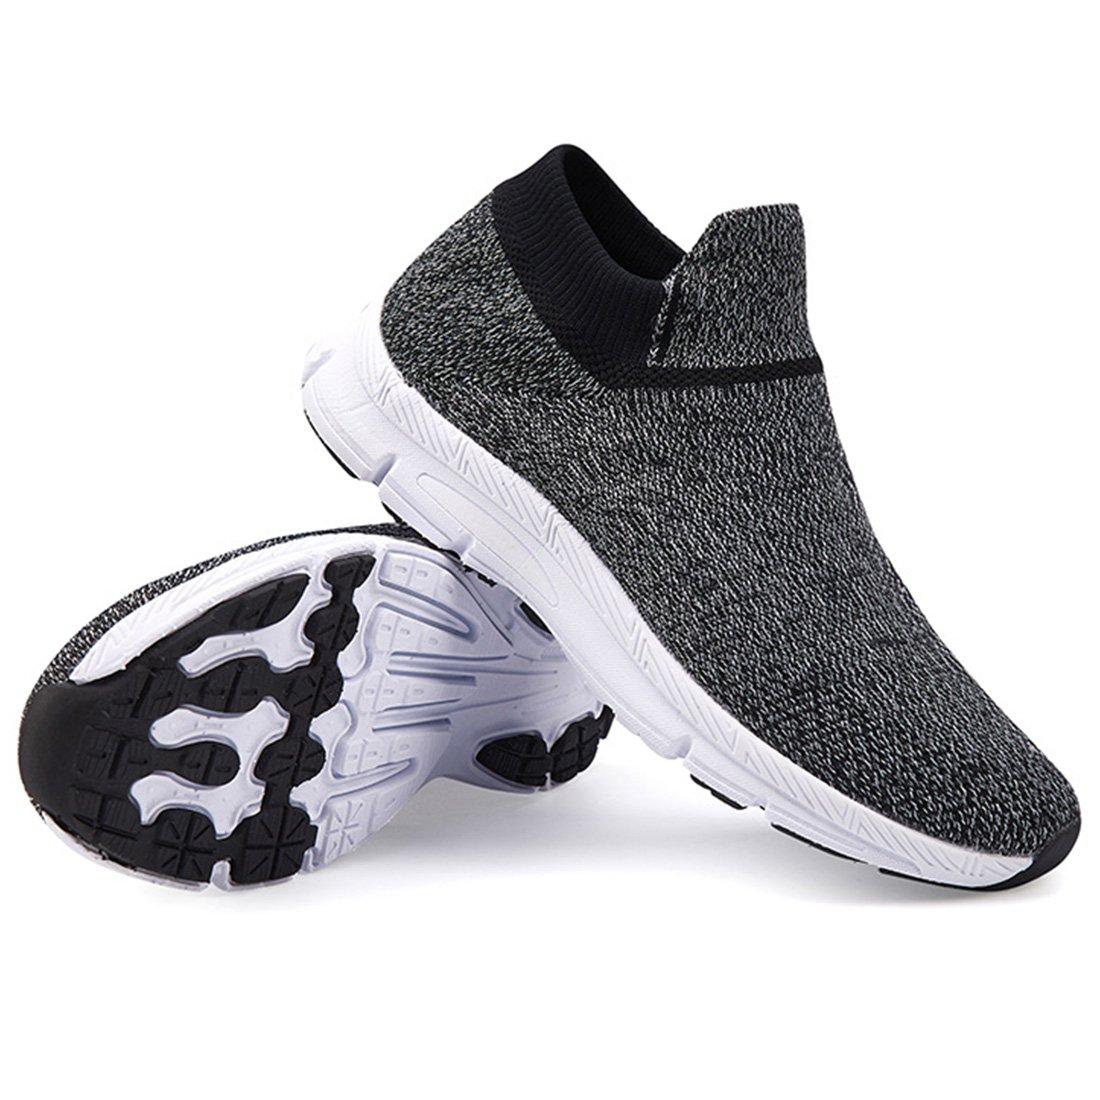 VIFUUR Girls Boys Socks Shoes Fashion Casual Walking Shoes Breathable Lightweight Sneakers for Kids Black/White-34